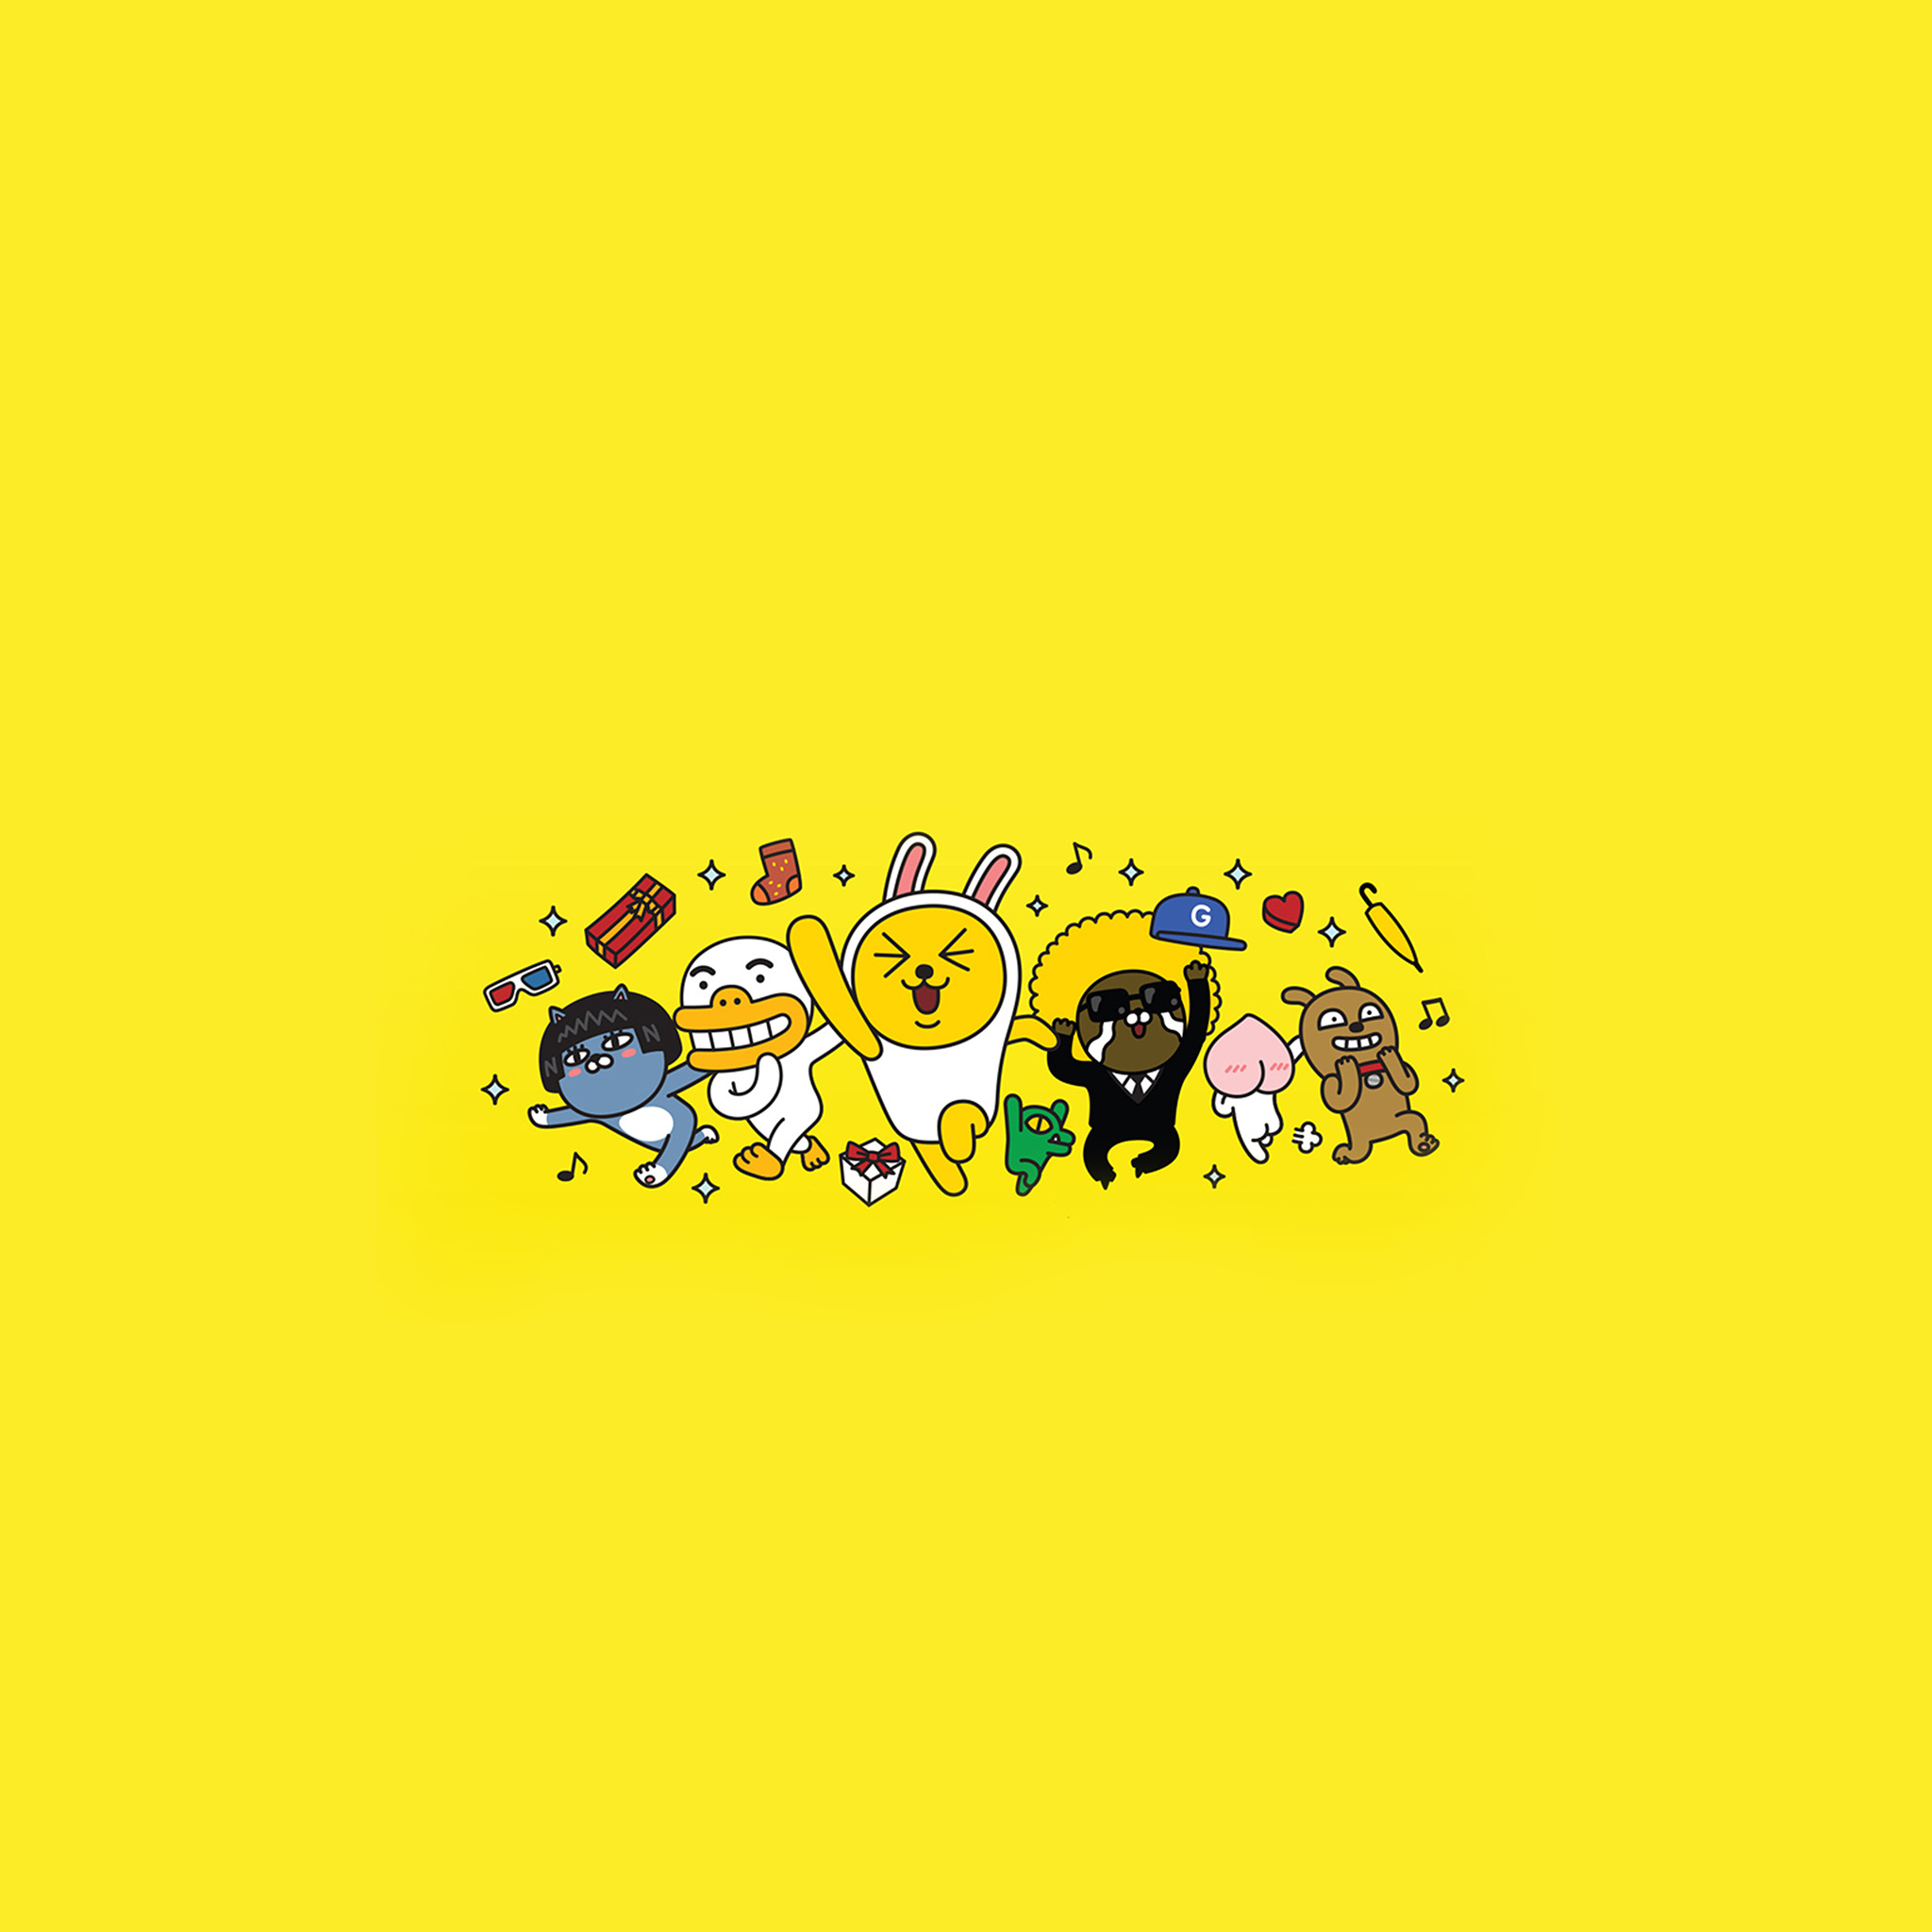 Bc88 Kakao Yellow Friends Anime Art Illustration Wallpaper